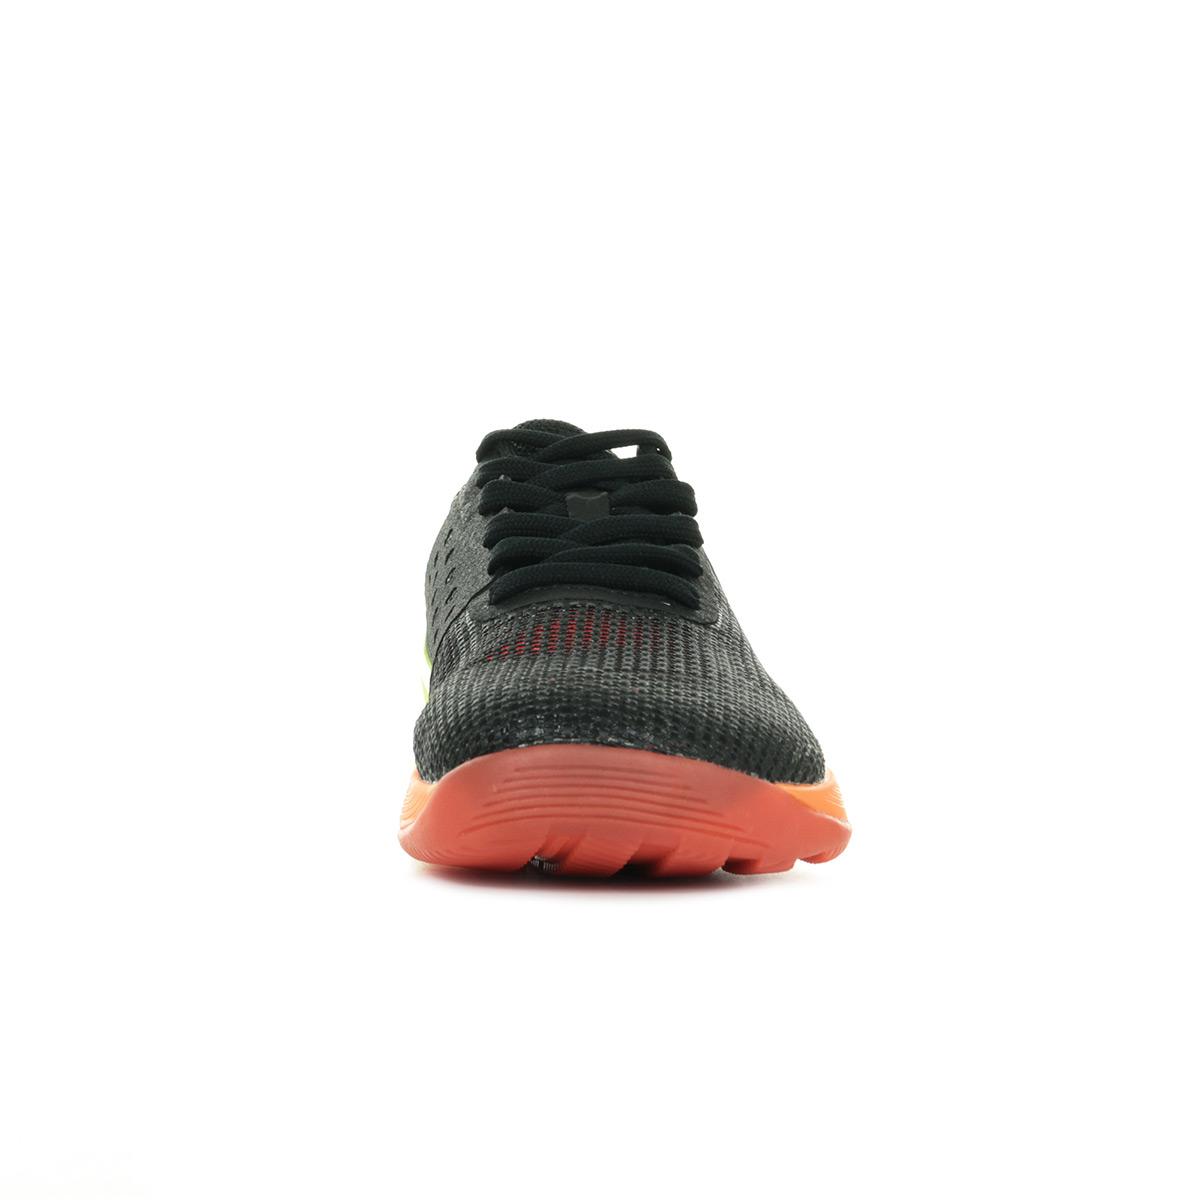 2b6c071e7e78fc ... Reebok Crossfit Nano 7.0 · Reebok Crossfit Nano 7.0 · Reebok Crossfit  Nano 7.0 · Accueil · Chaussures · Chaussures Femme · Fitness ...